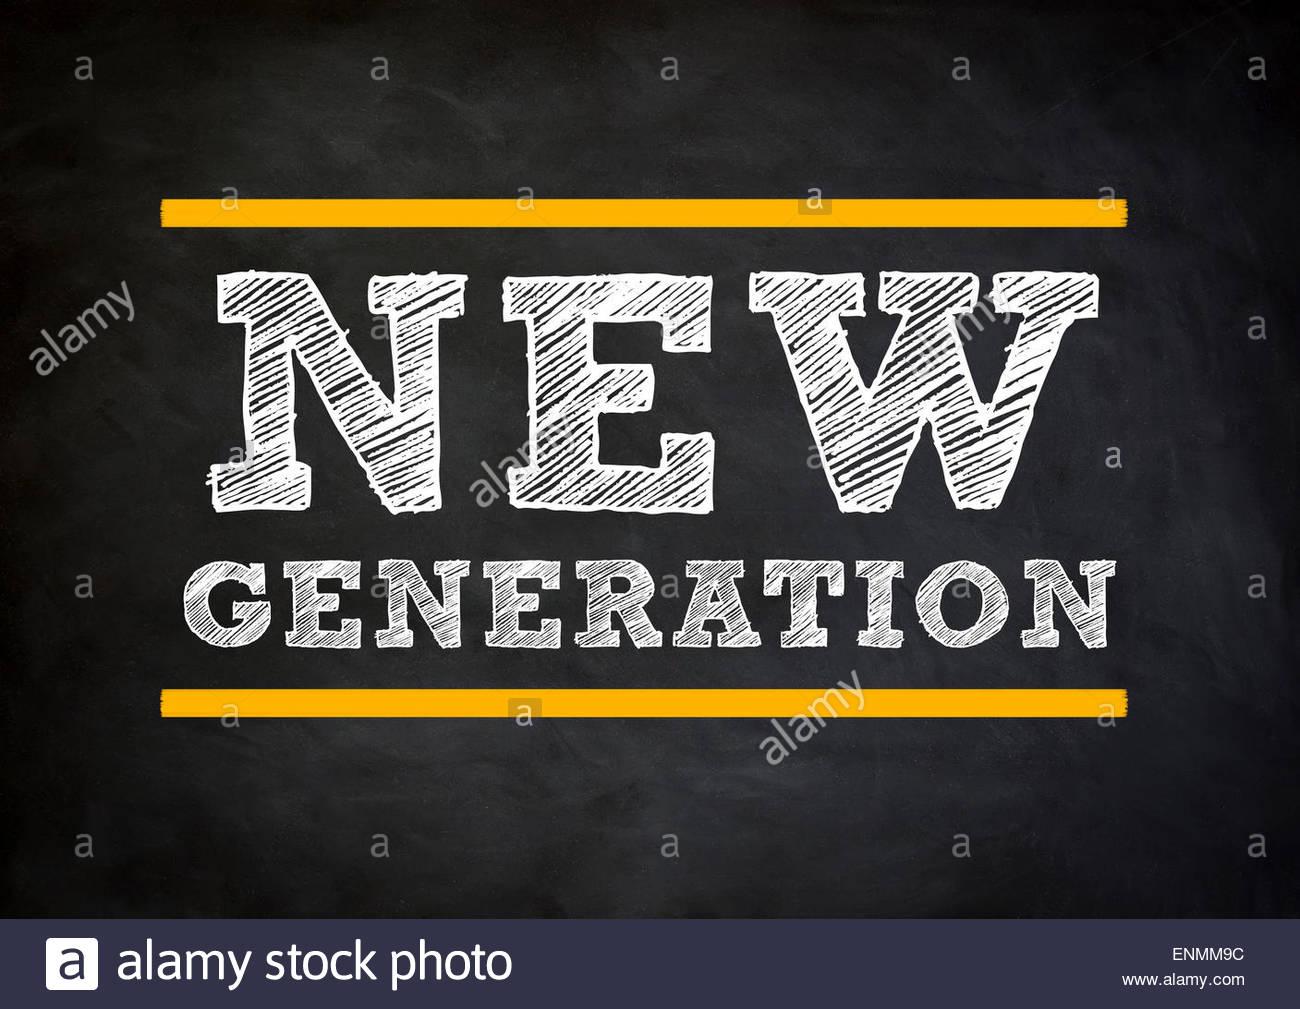 new generation - Stock Image